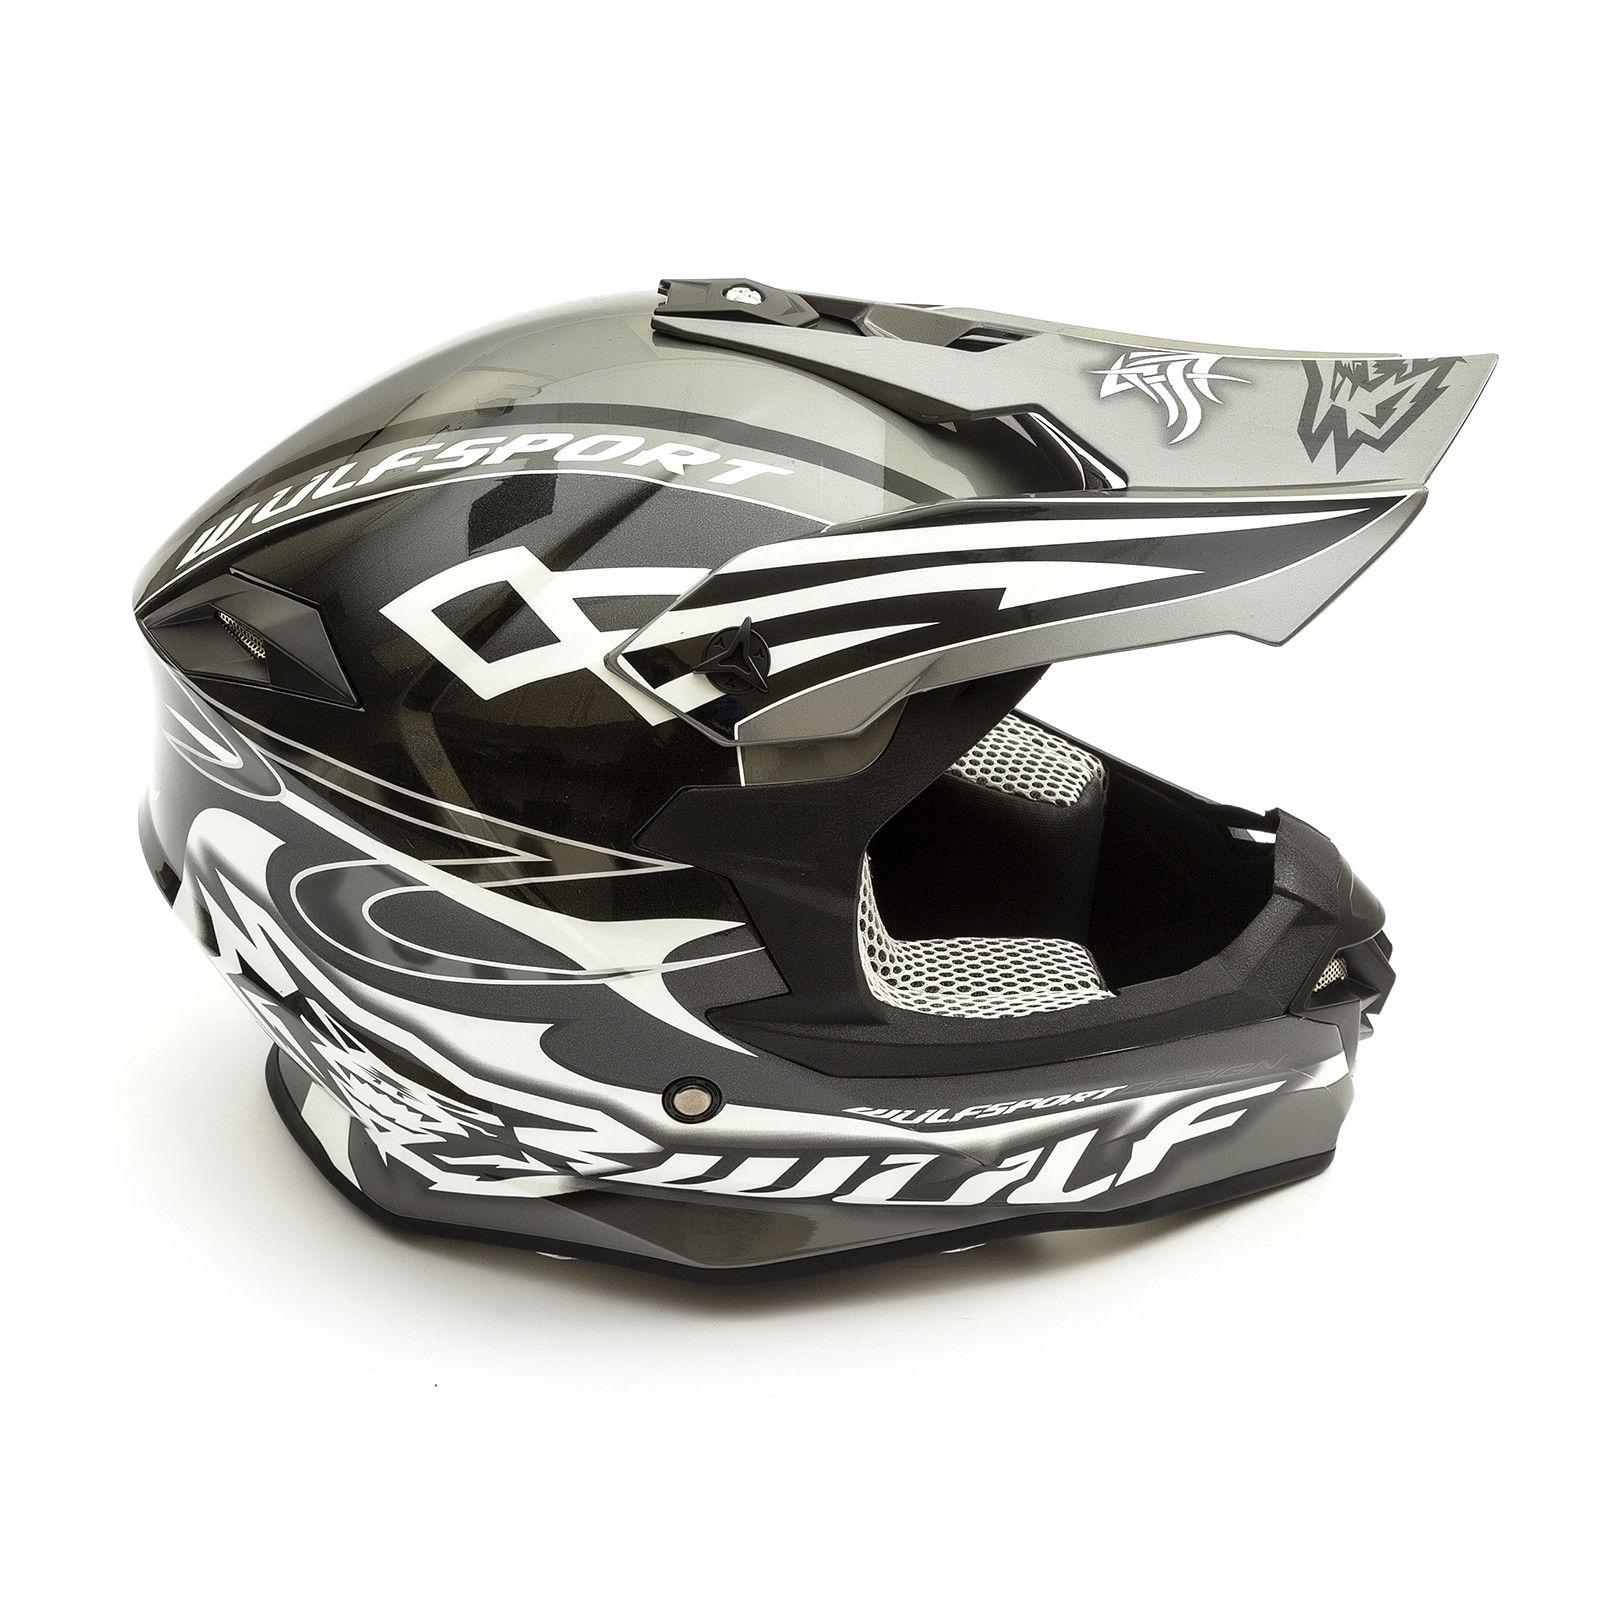 Wulfsport-Adult-Sceptre-Helmets-Motocross-Pitbike-Motorbike-Off-Road-Racing-ATV thumbnail 8